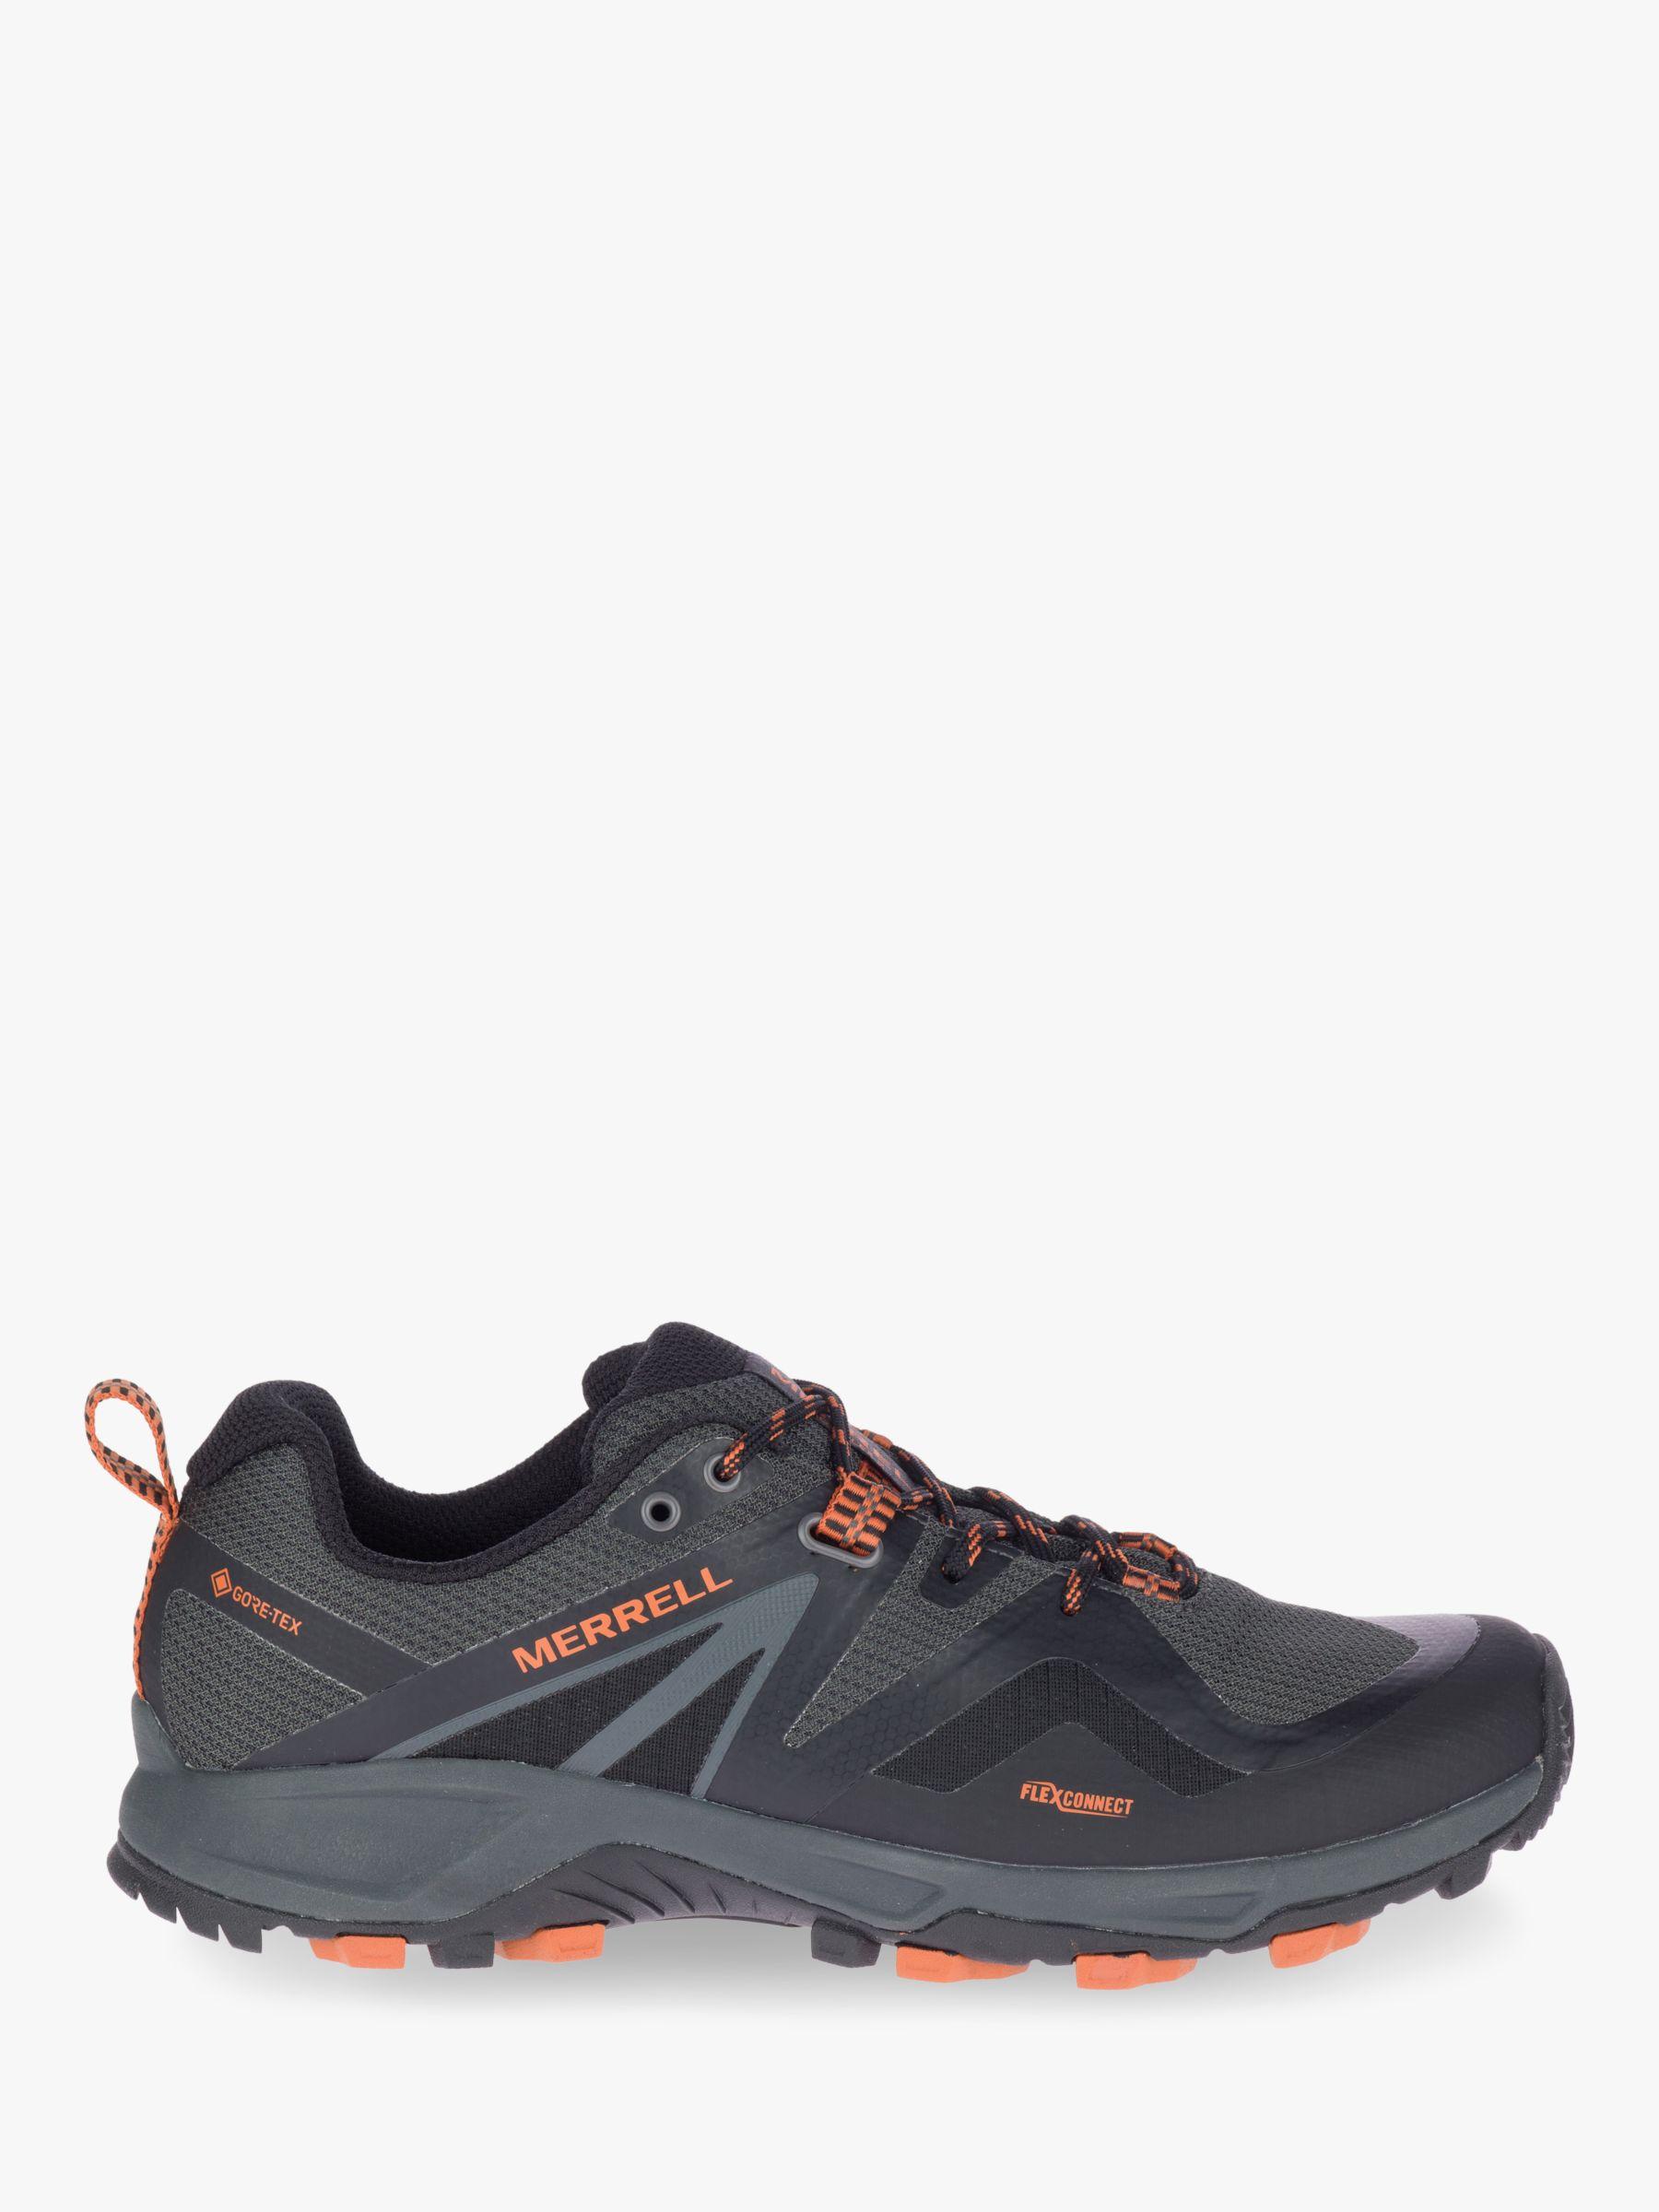 Merrell Merrell MQM Flex 2 Men's Waterproof Gore-Tex Walking Shoes, Burnt/Granite